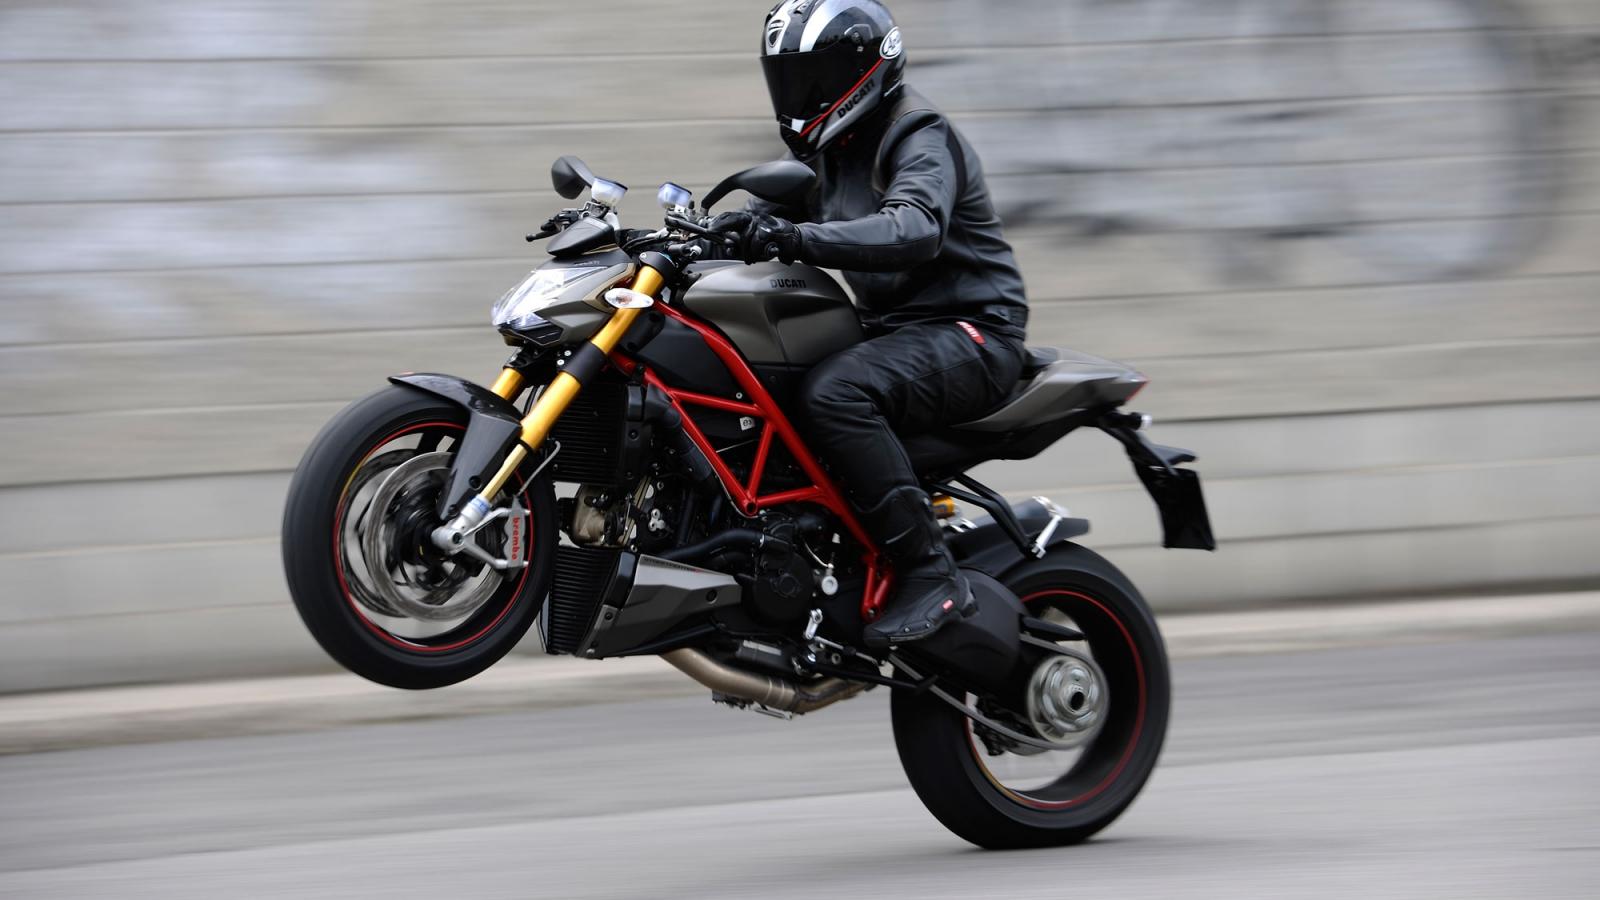 Caballito en Ducati - 1600x900